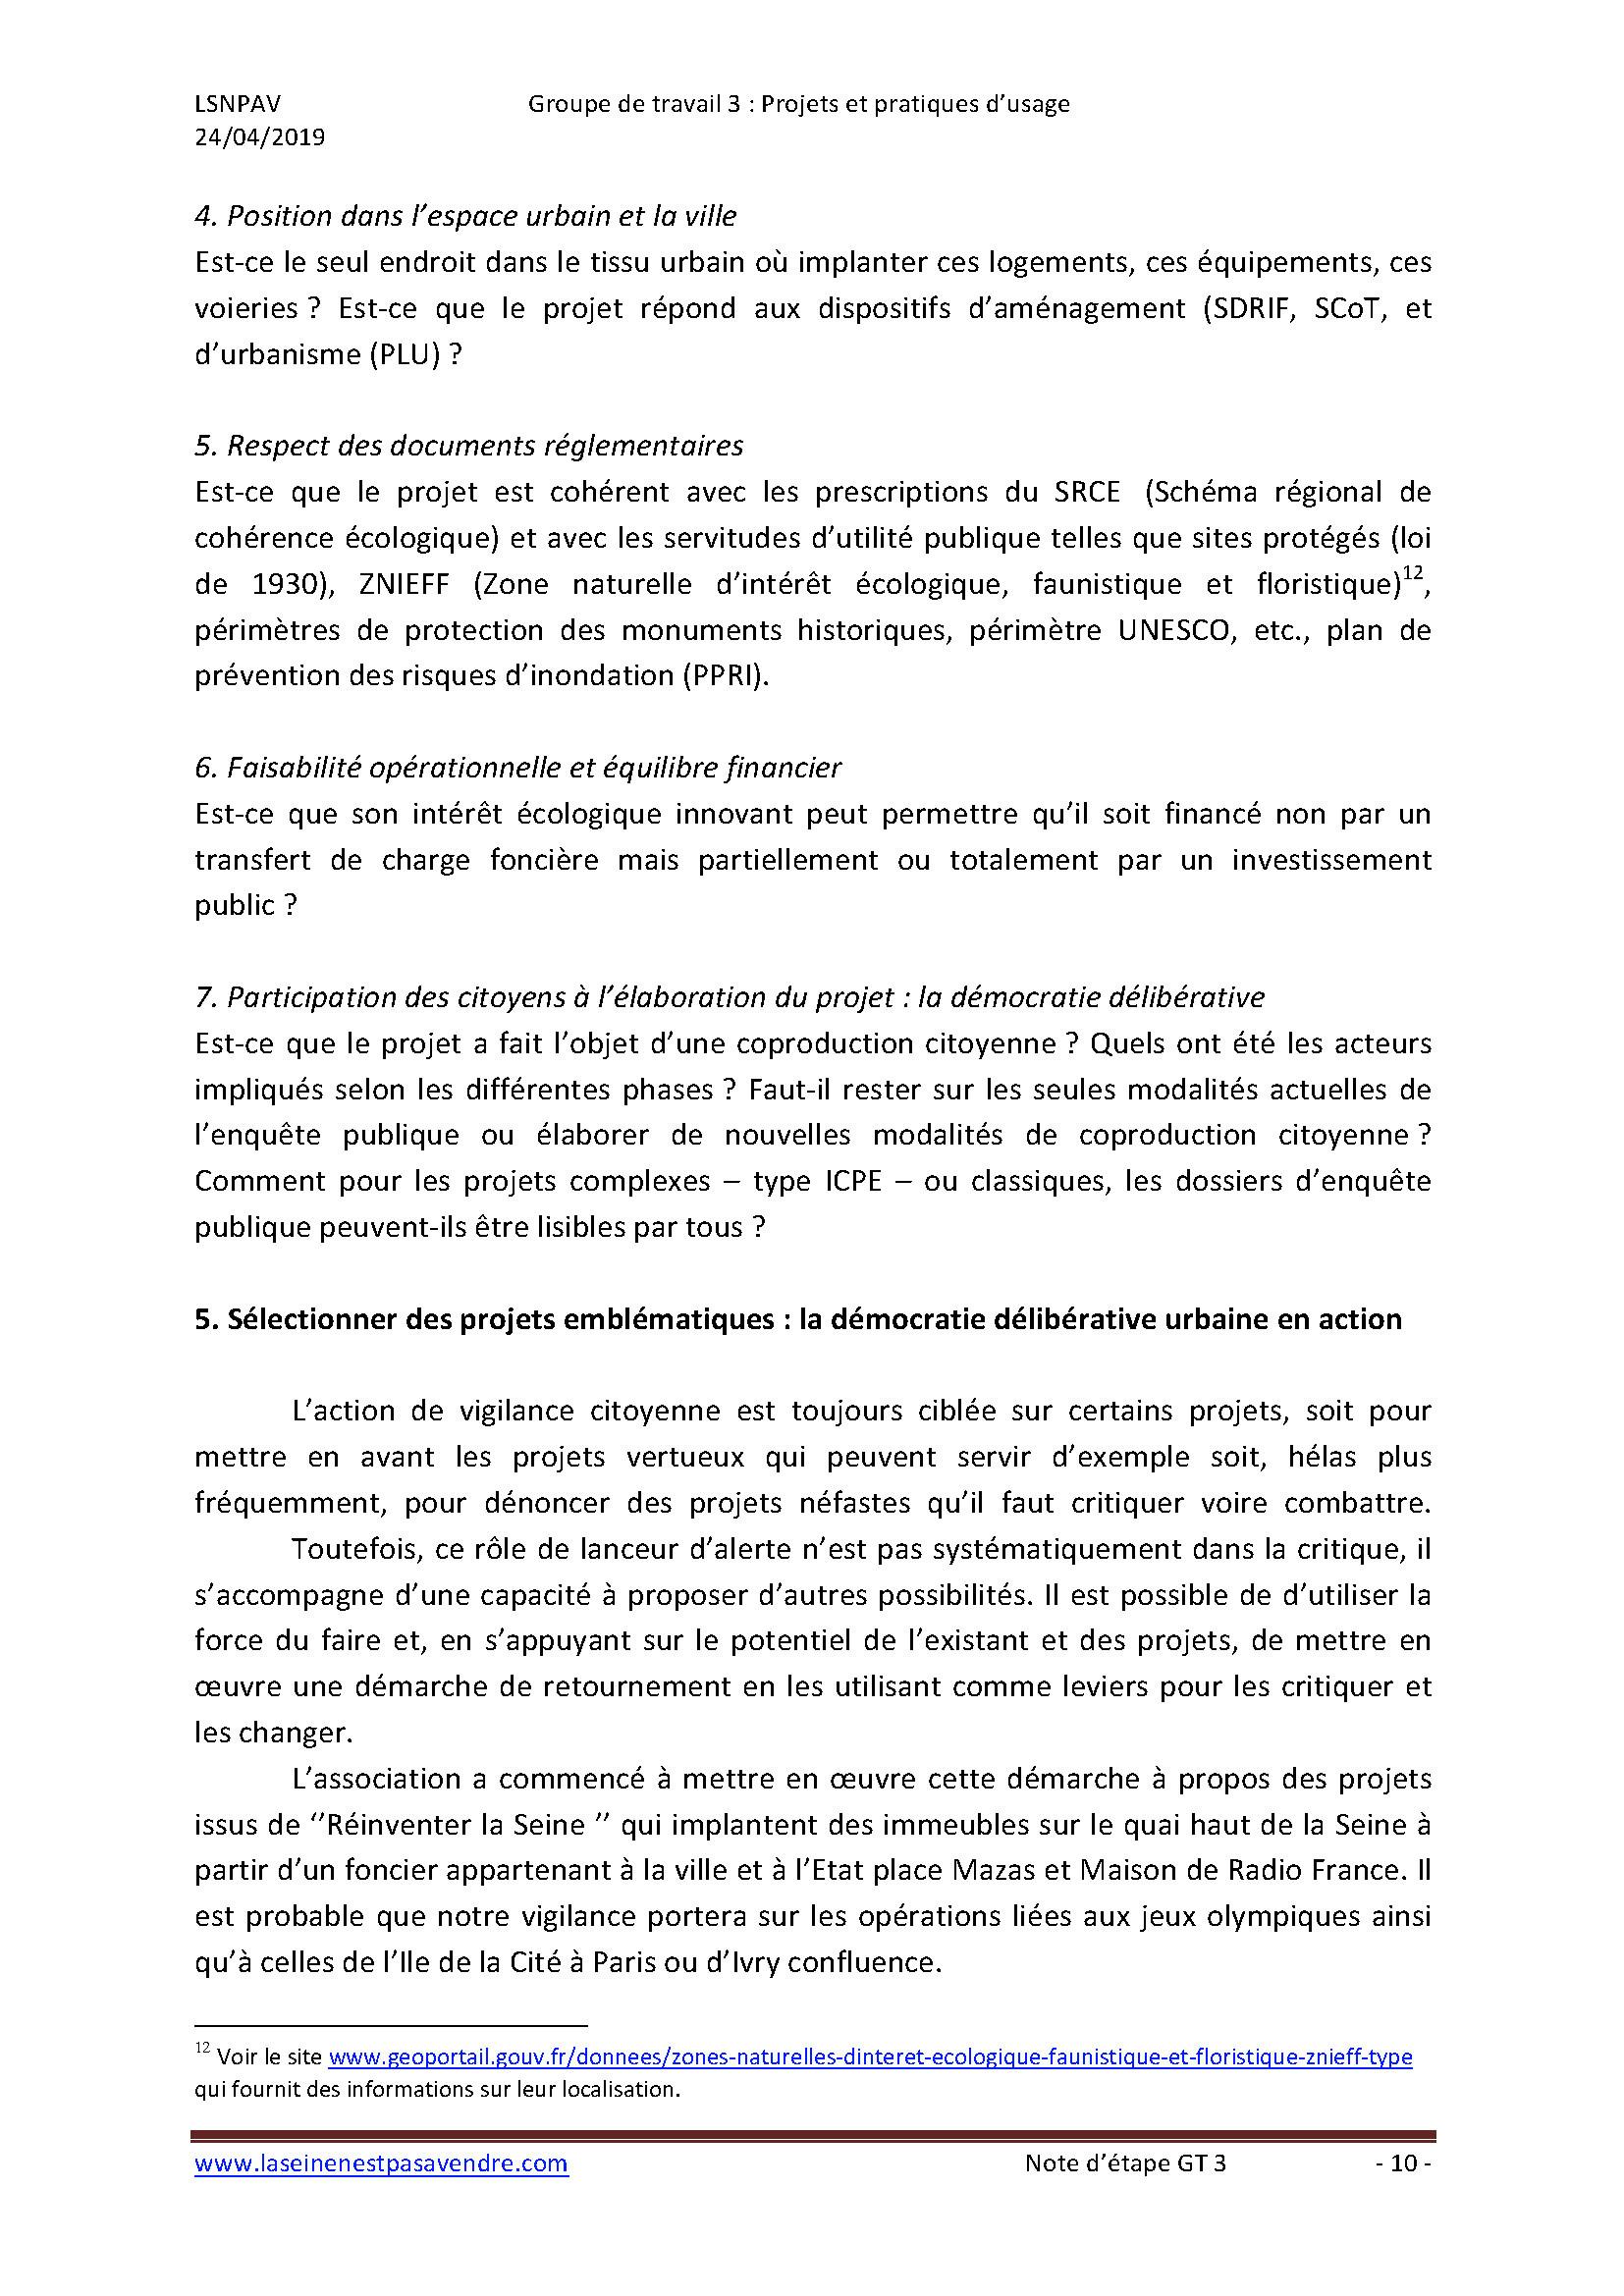 GT 3 Note d'étape_Page_10.jpg